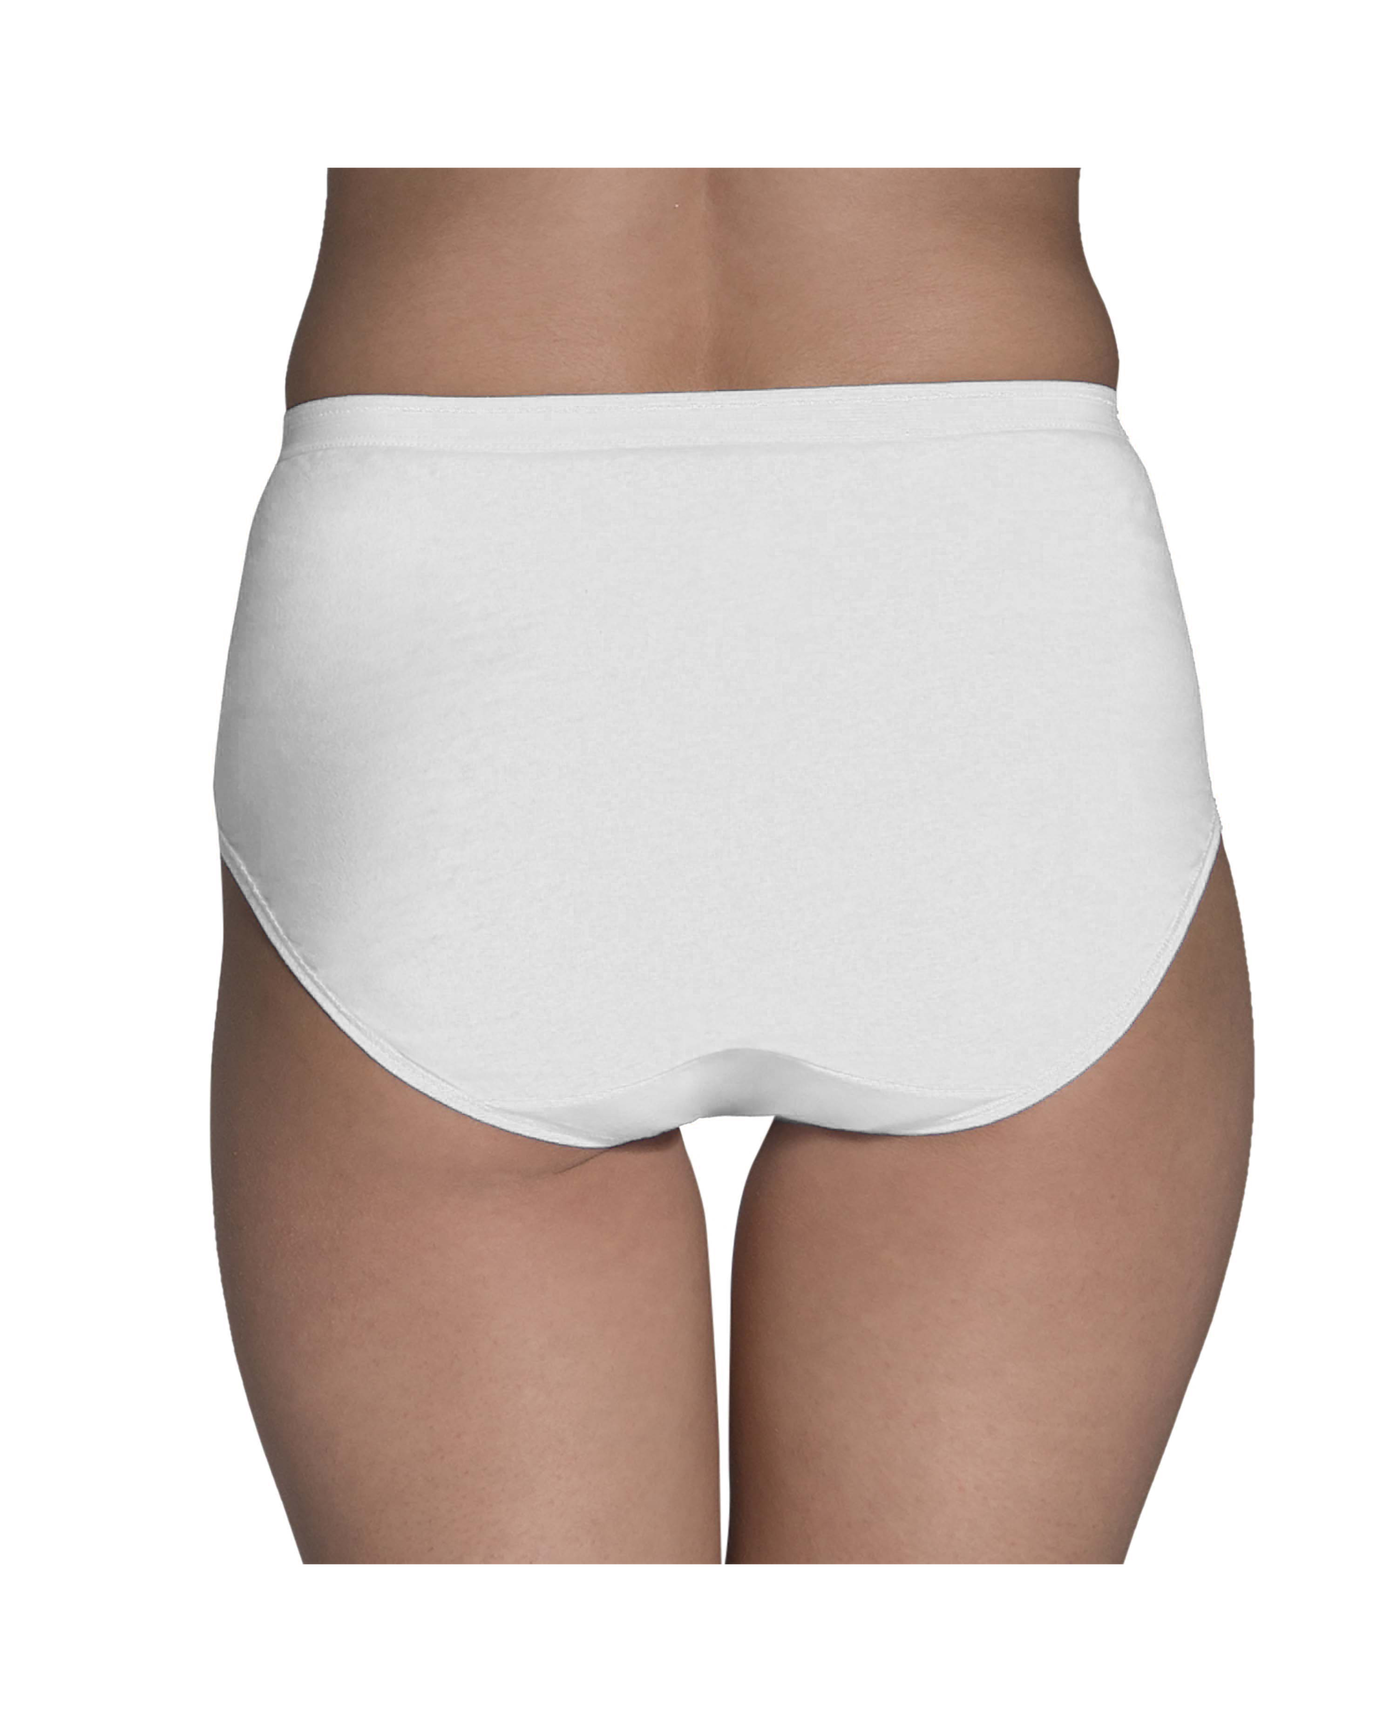 62eaa5cb3d ... Women s White Cotton Brief